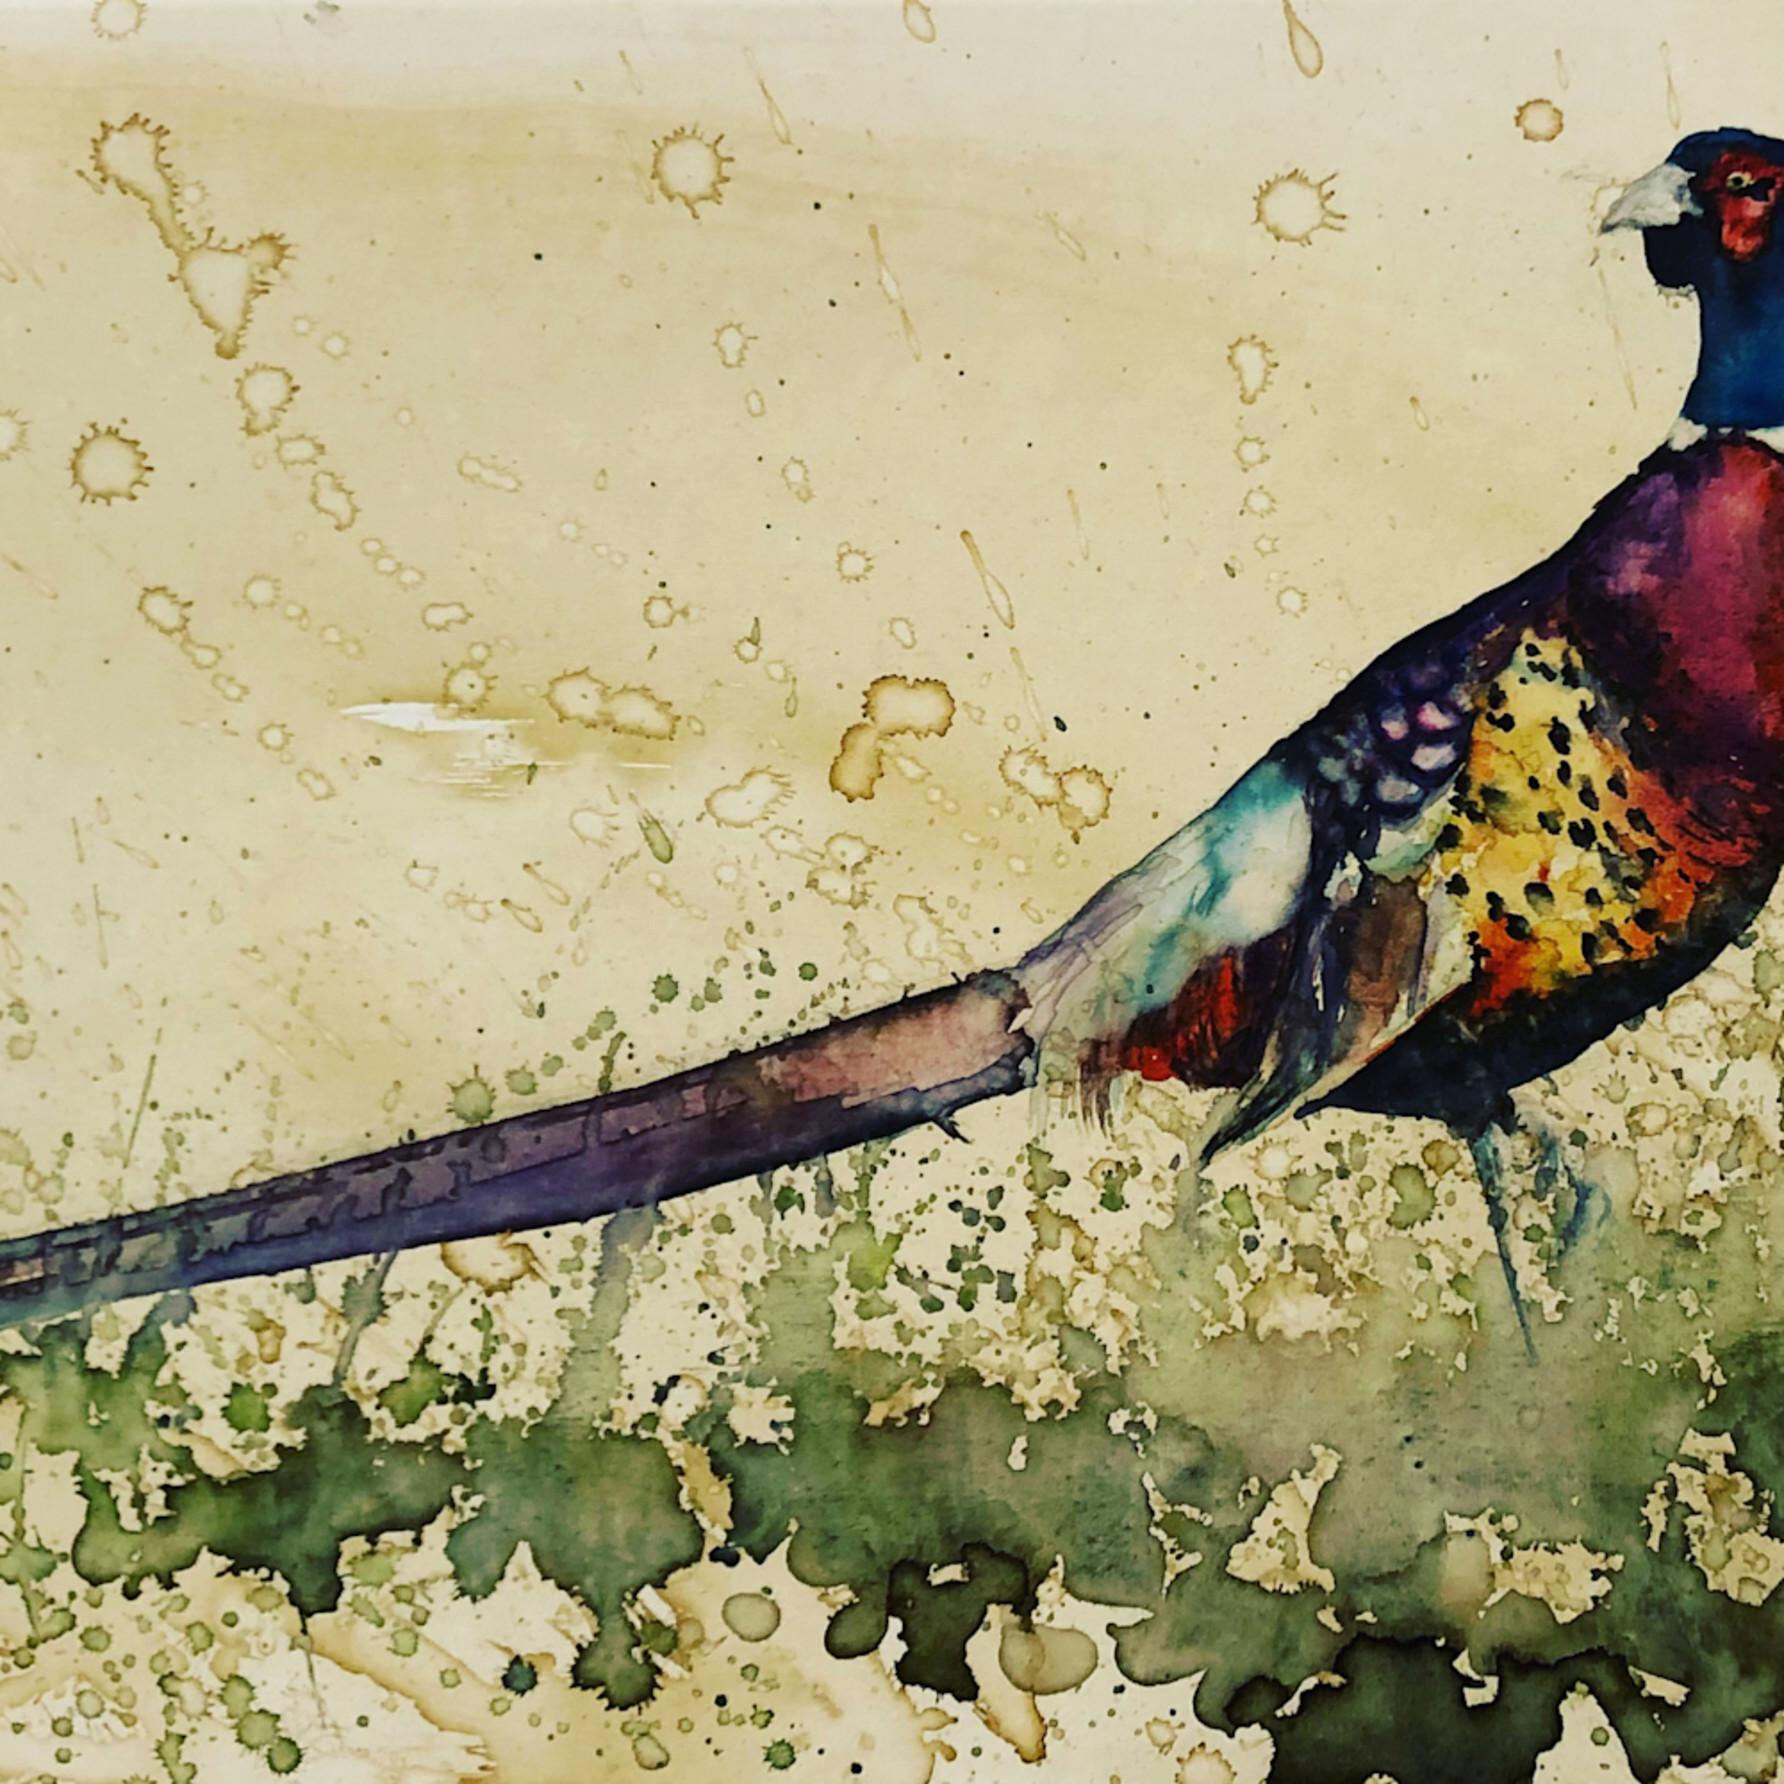 Pheasant stand jmuwzq